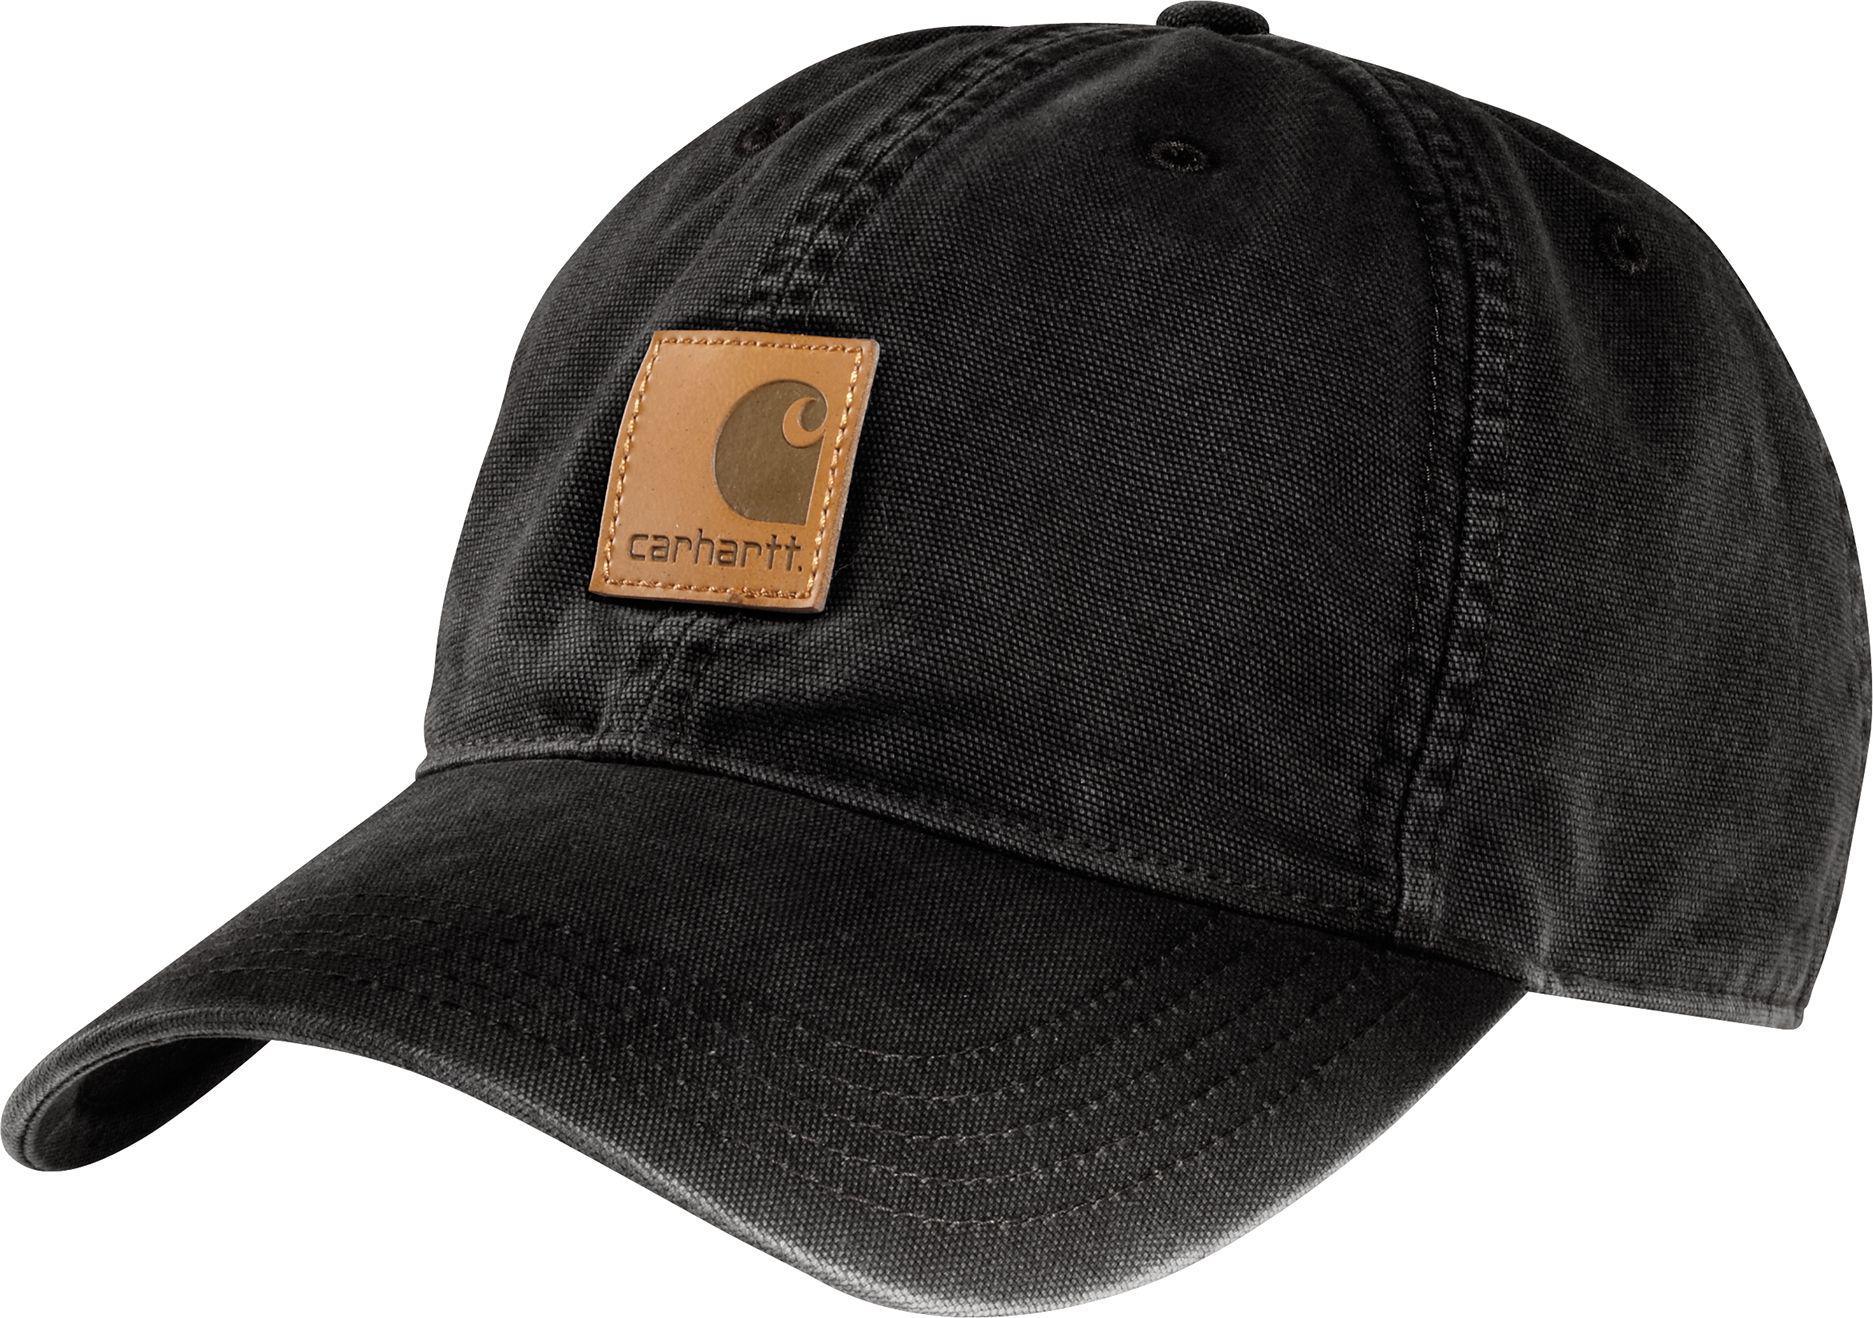 1b46882435 Carhartt Odessa Hat in Black for Men - Lyst